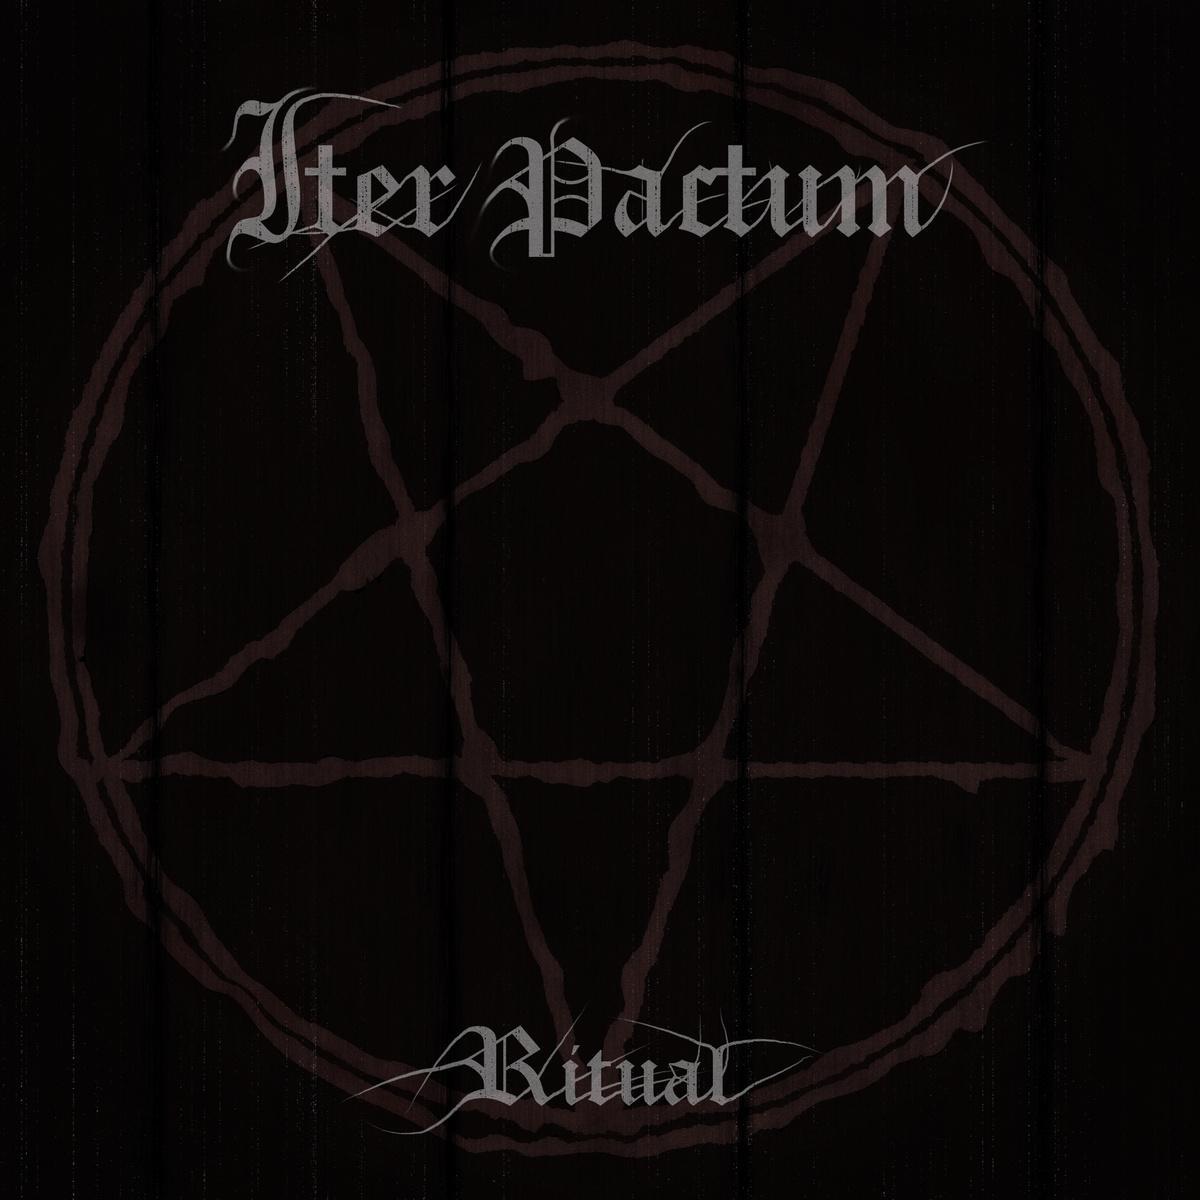 Iter Pactum Ritual